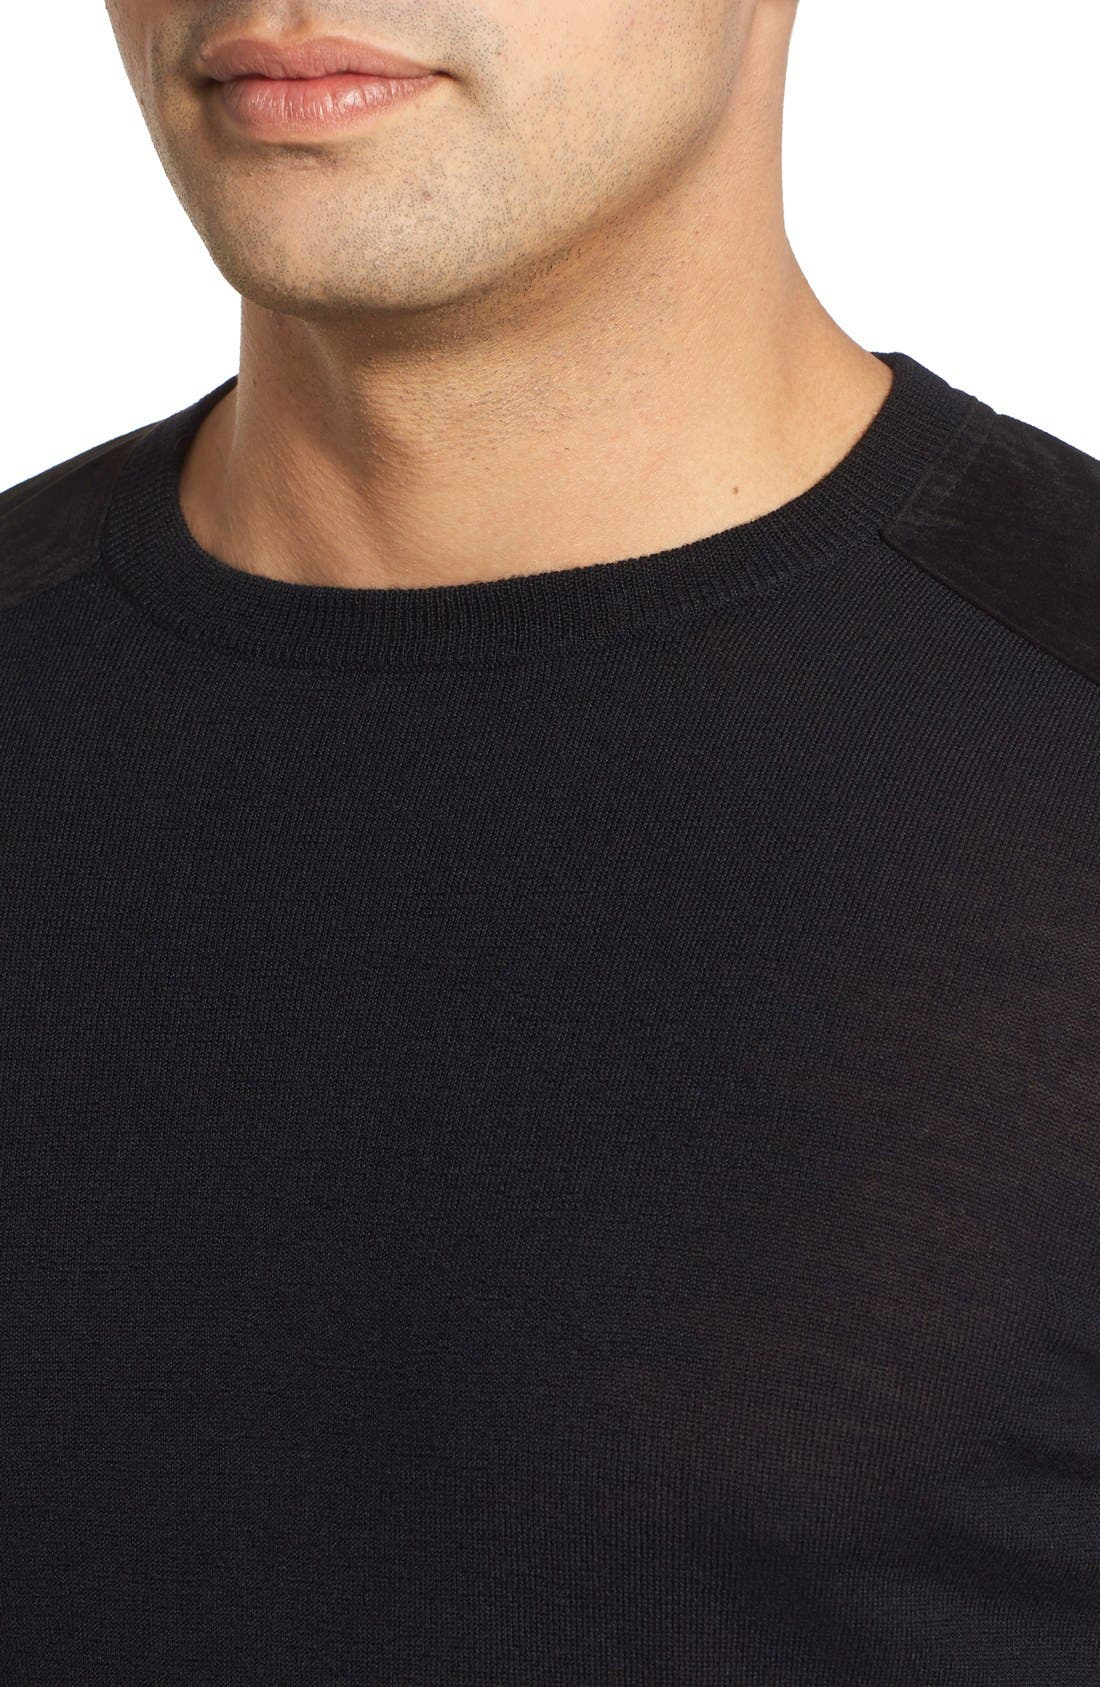 Regular Fit Crewneck Sweater,                             Alternate thumbnail 3, color,                             001